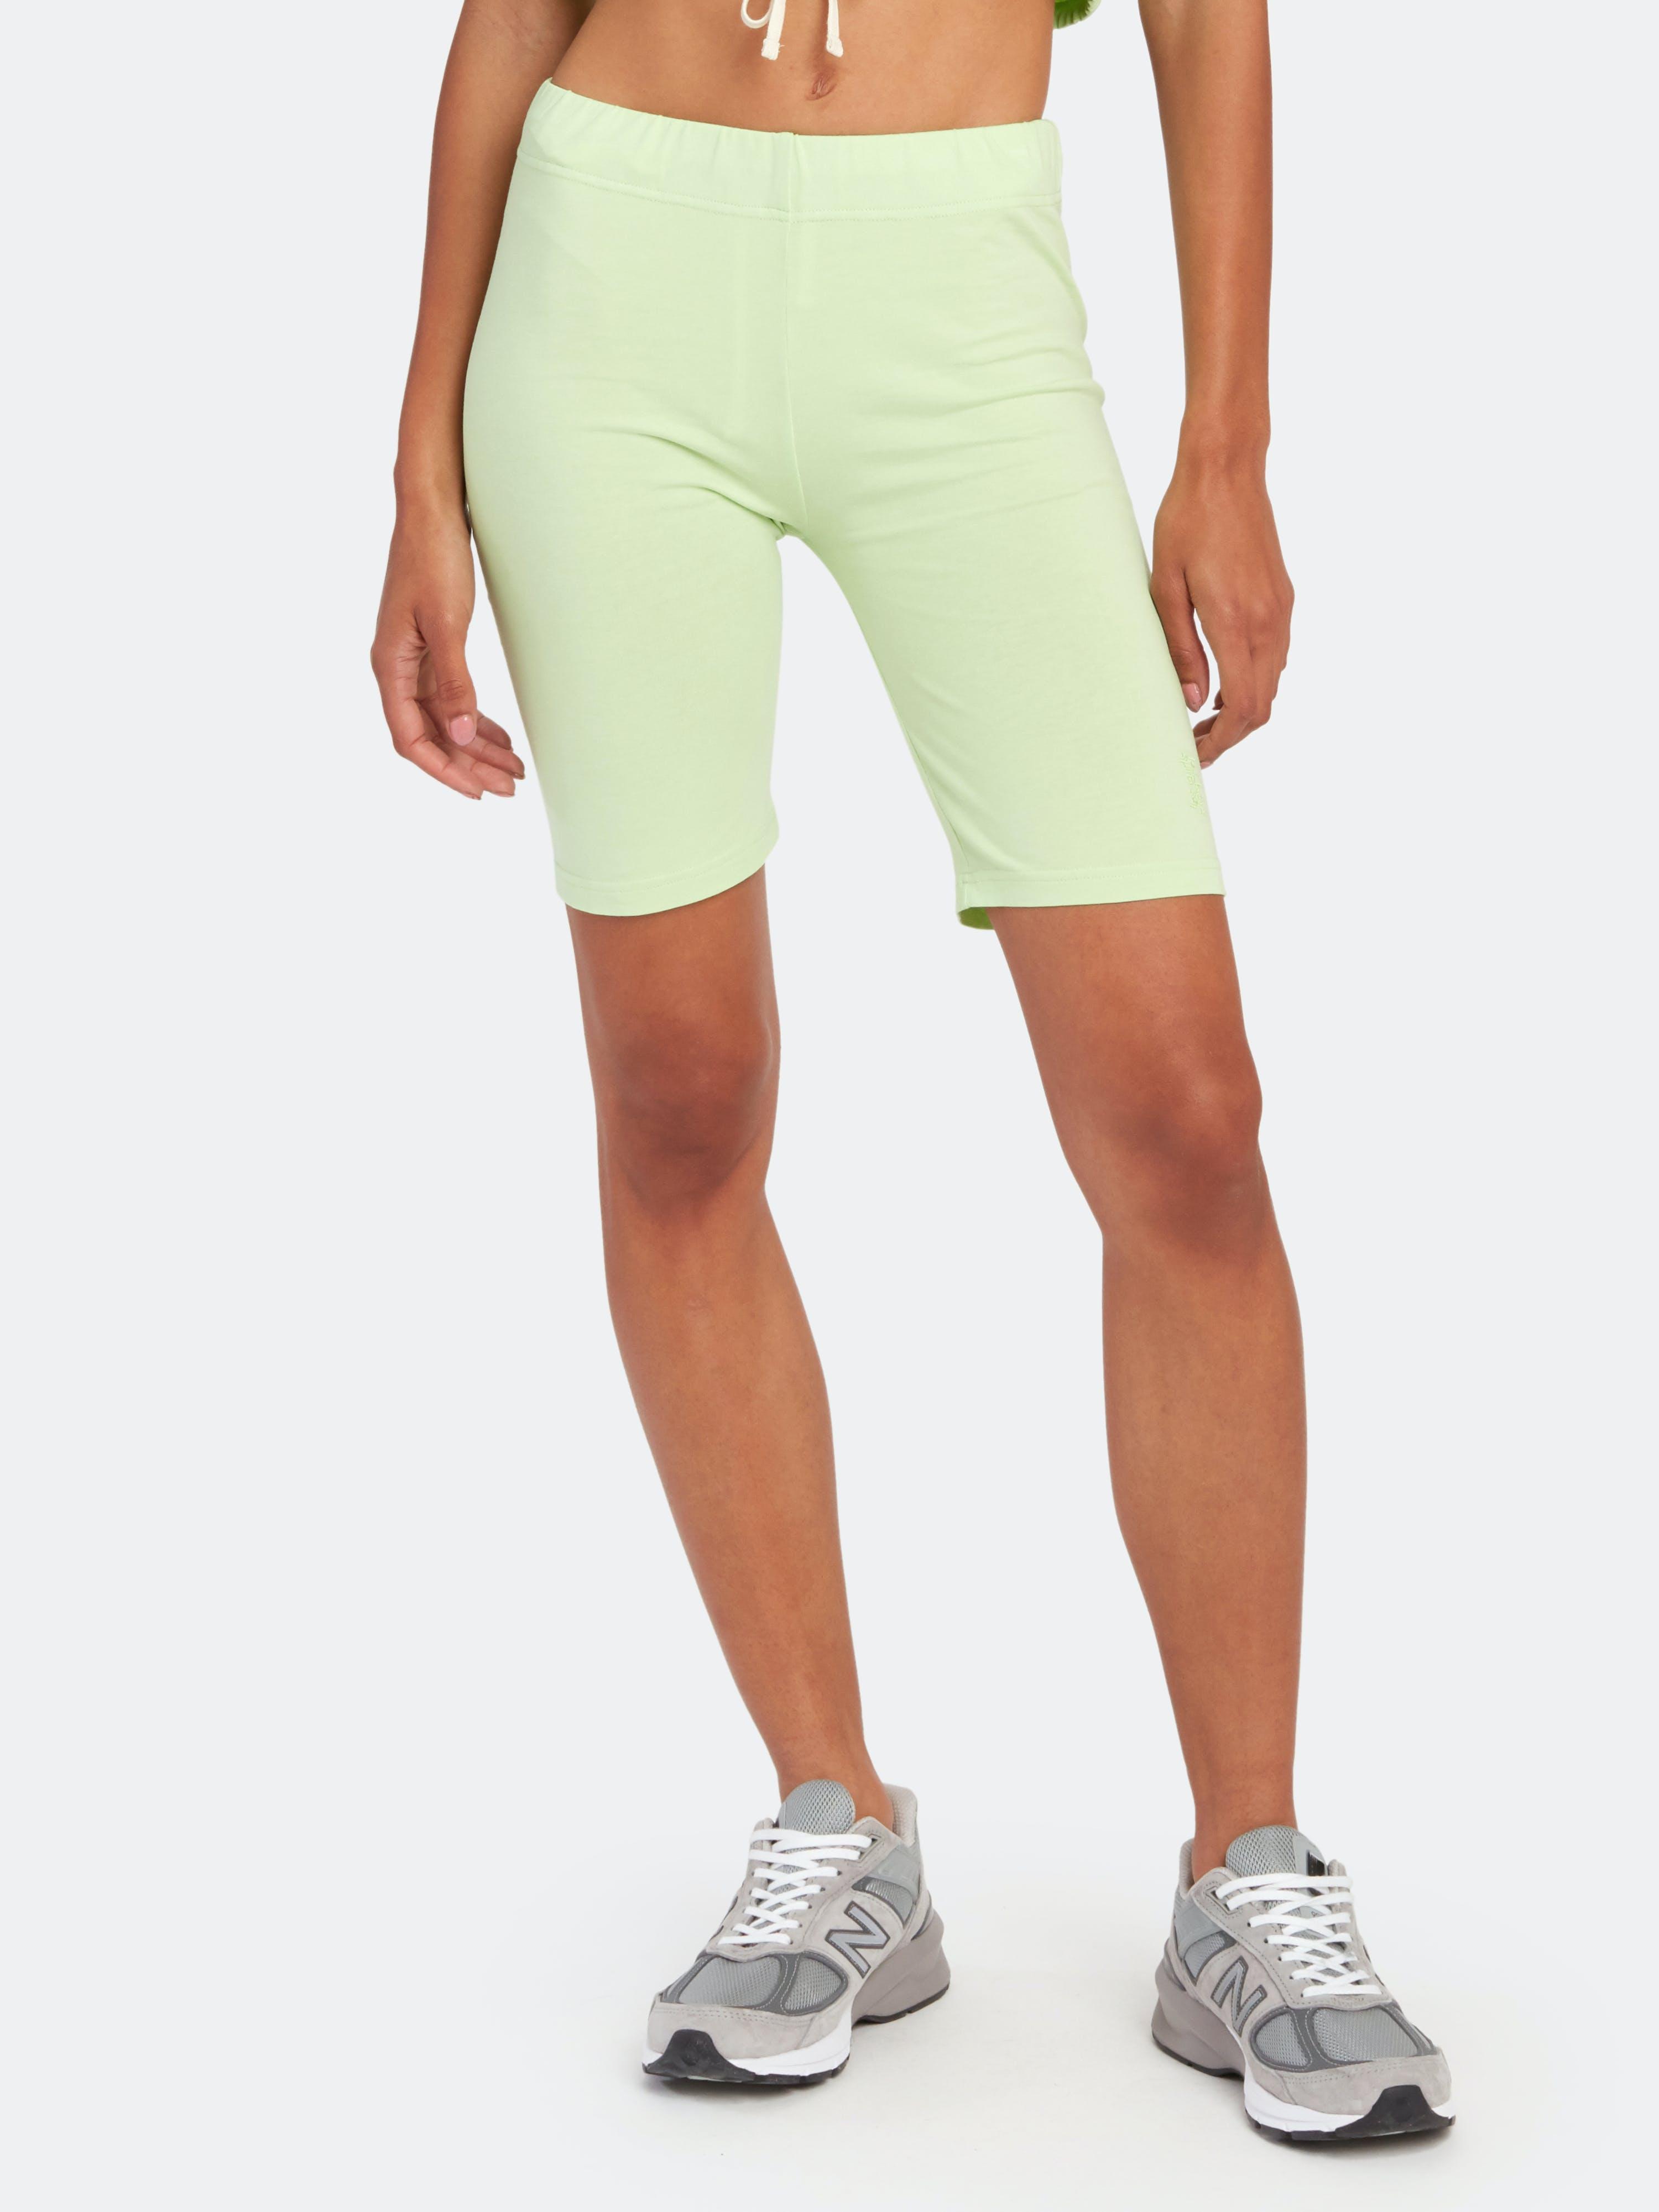 Les Girls Les Boys Tight Bike Shorts - XS - Also in: M, L, XL, S  - Green